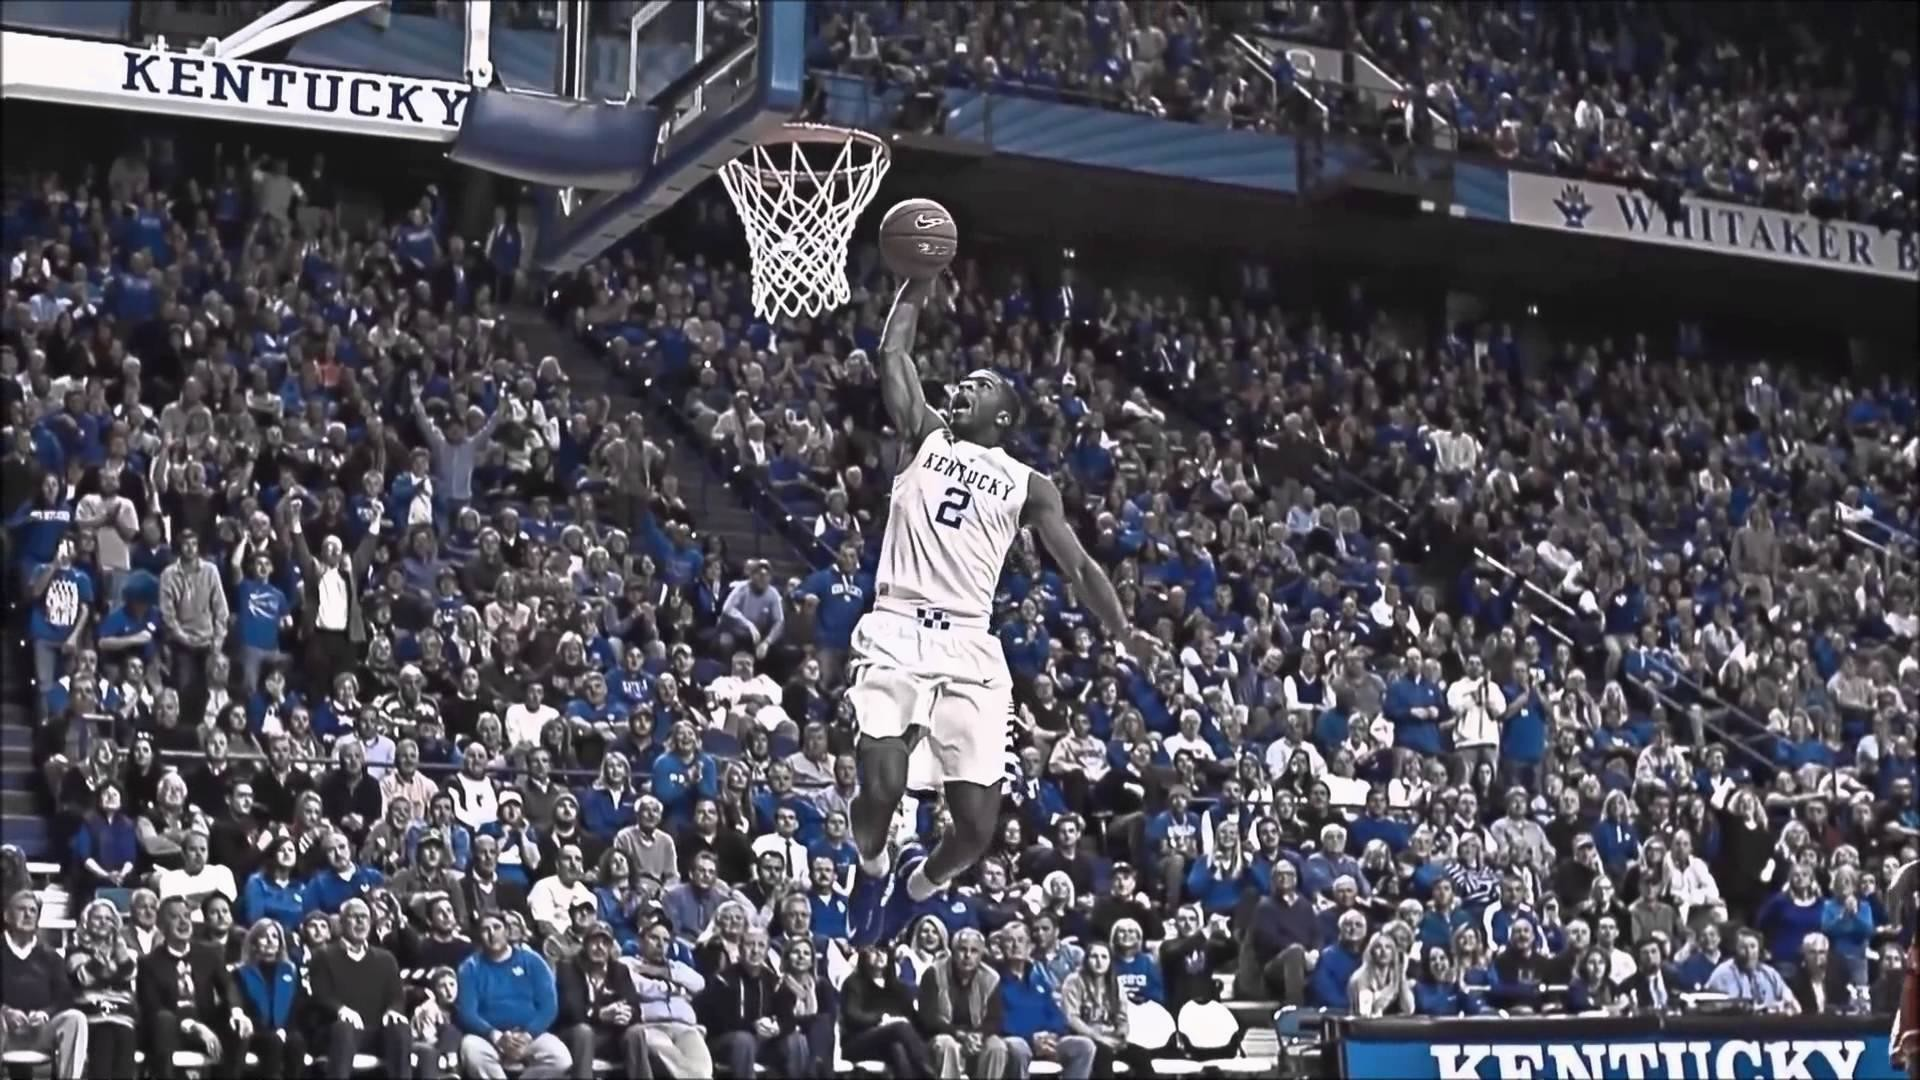 wallpaper.wiki-Mark-Ronson-Kentucky-Wildcats-Background-PIC-